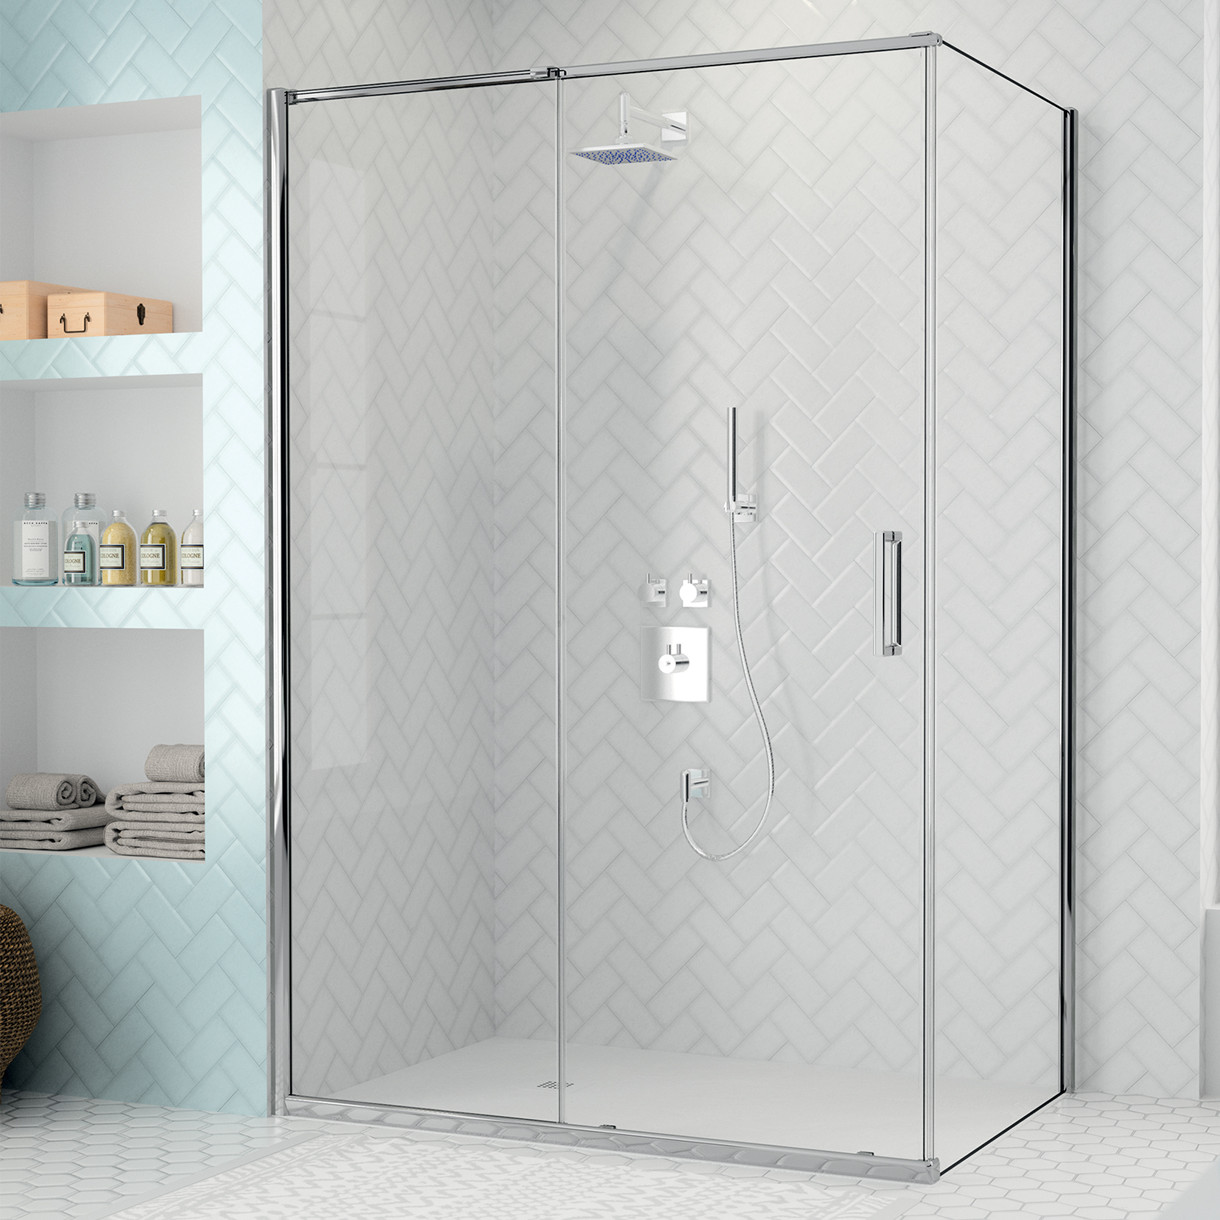 Arysto Eight sliding door with side panel